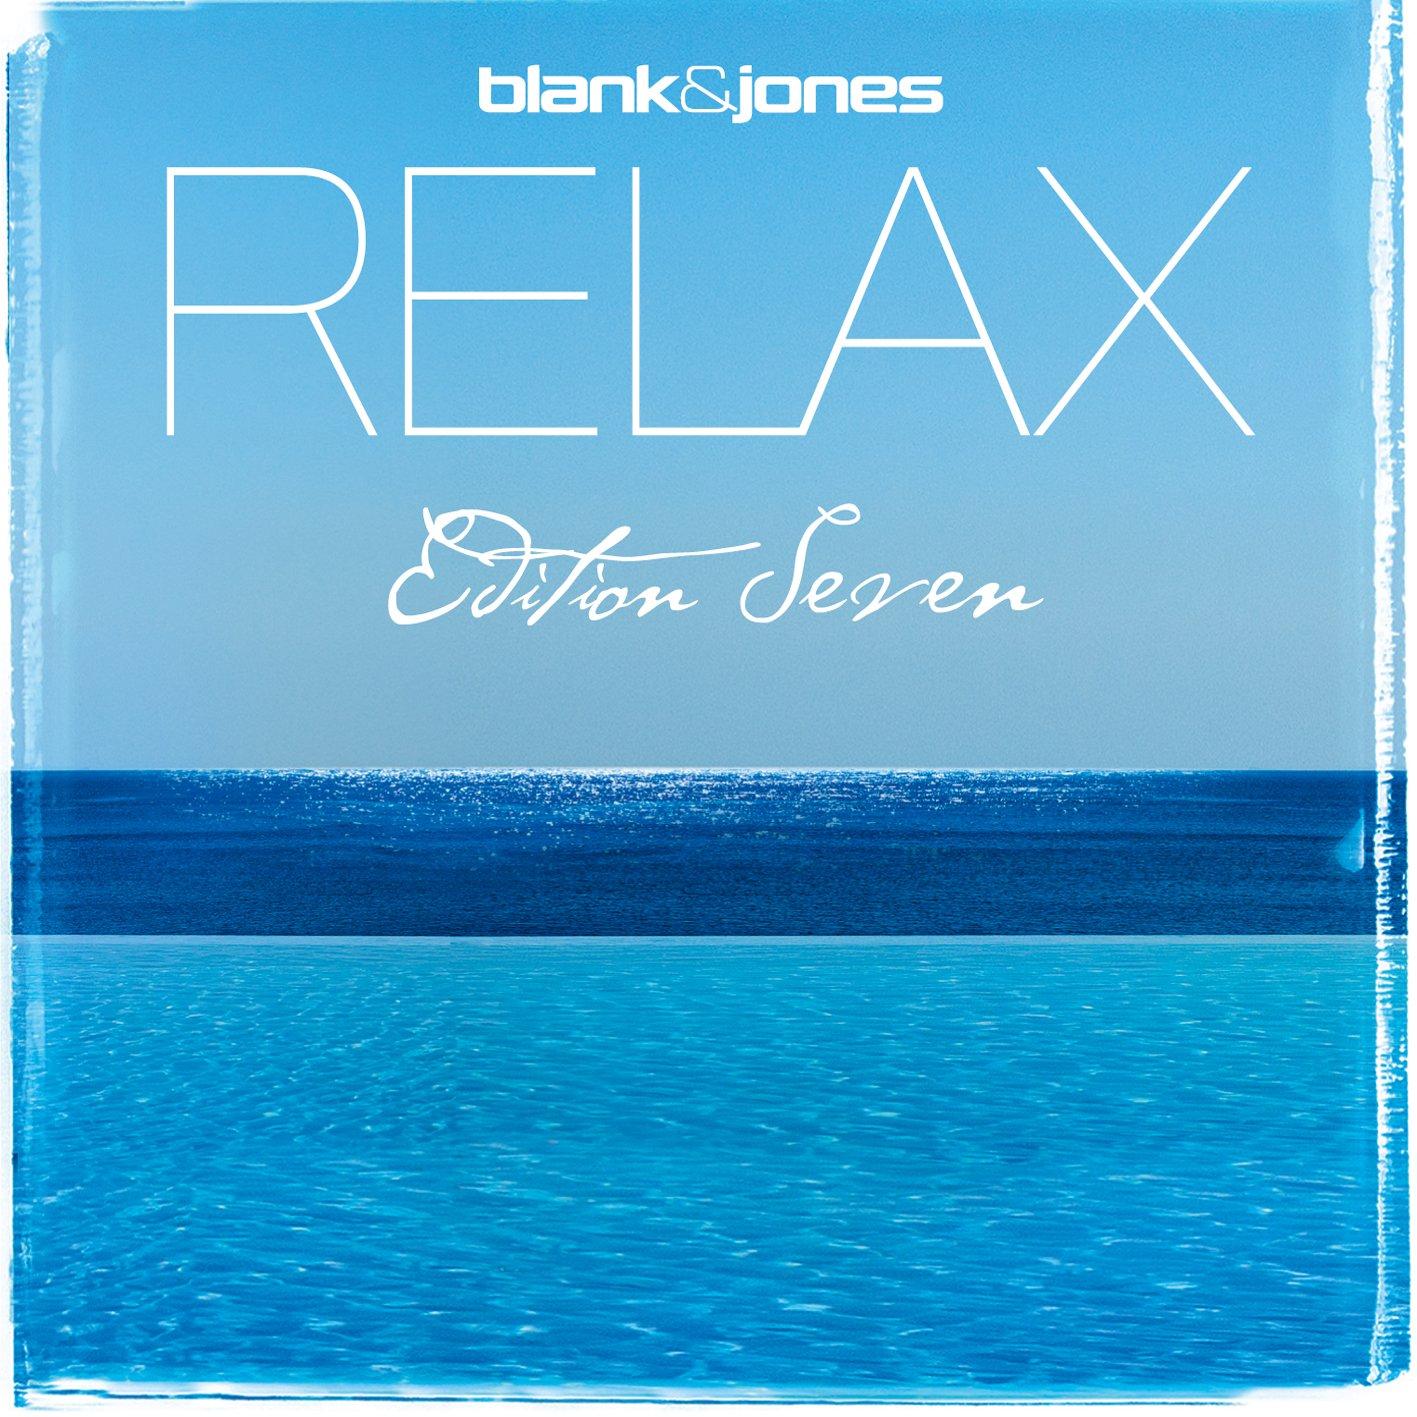 Blank & Jones - Relax 7 (2012)